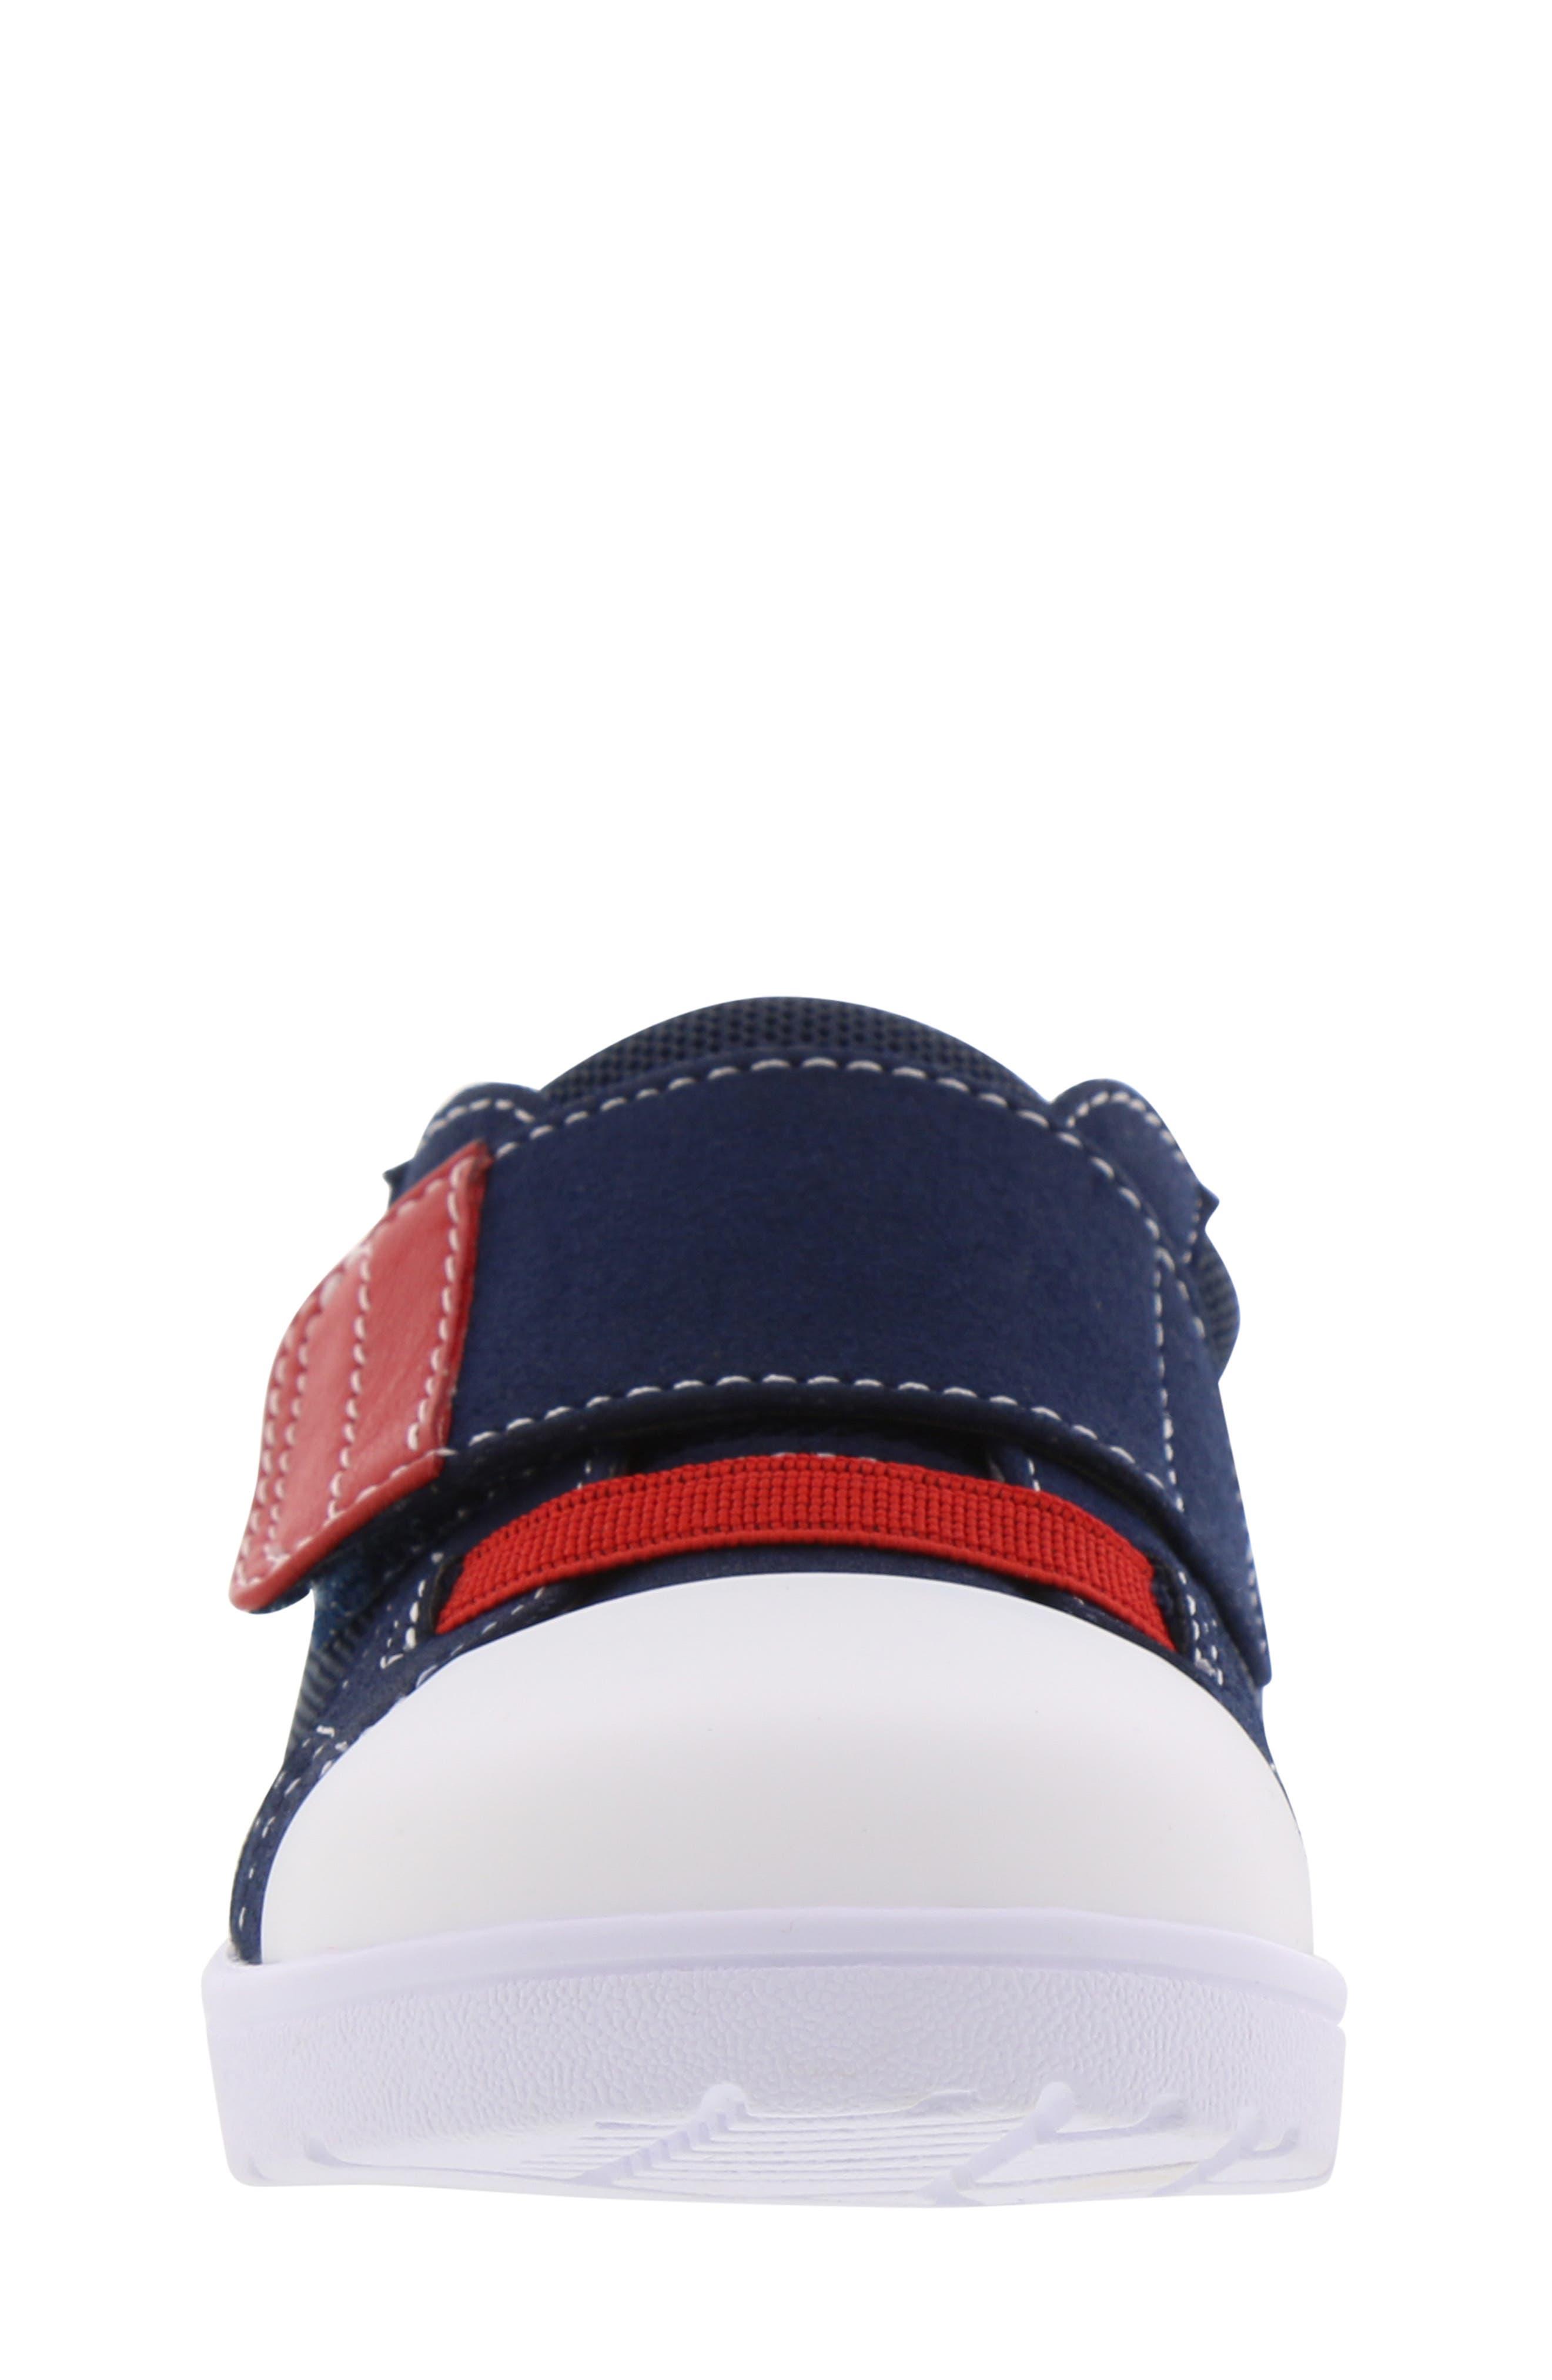 BØRN,                             Bailey Clark Sneaker,                             Alternate thumbnail 4, color,                             NAVY